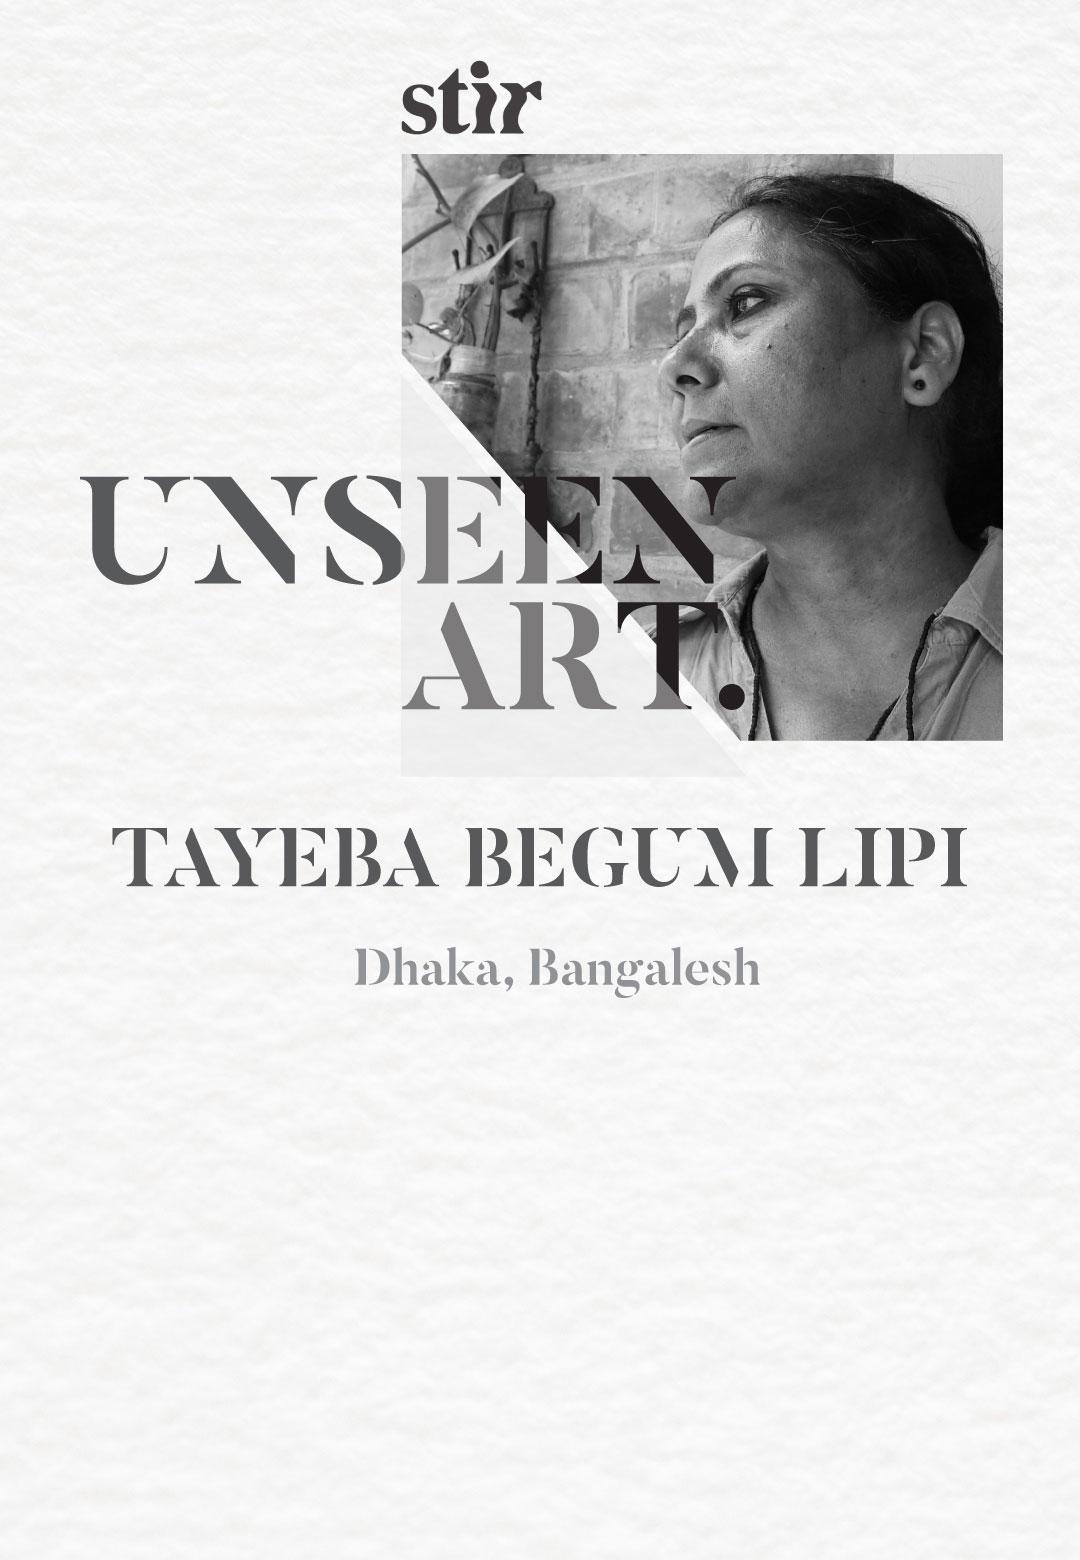 Bangladesh-based artist Tayeba Begum Lipi   | Tayeba Begum Lipi | Unseen Art | STIRworld